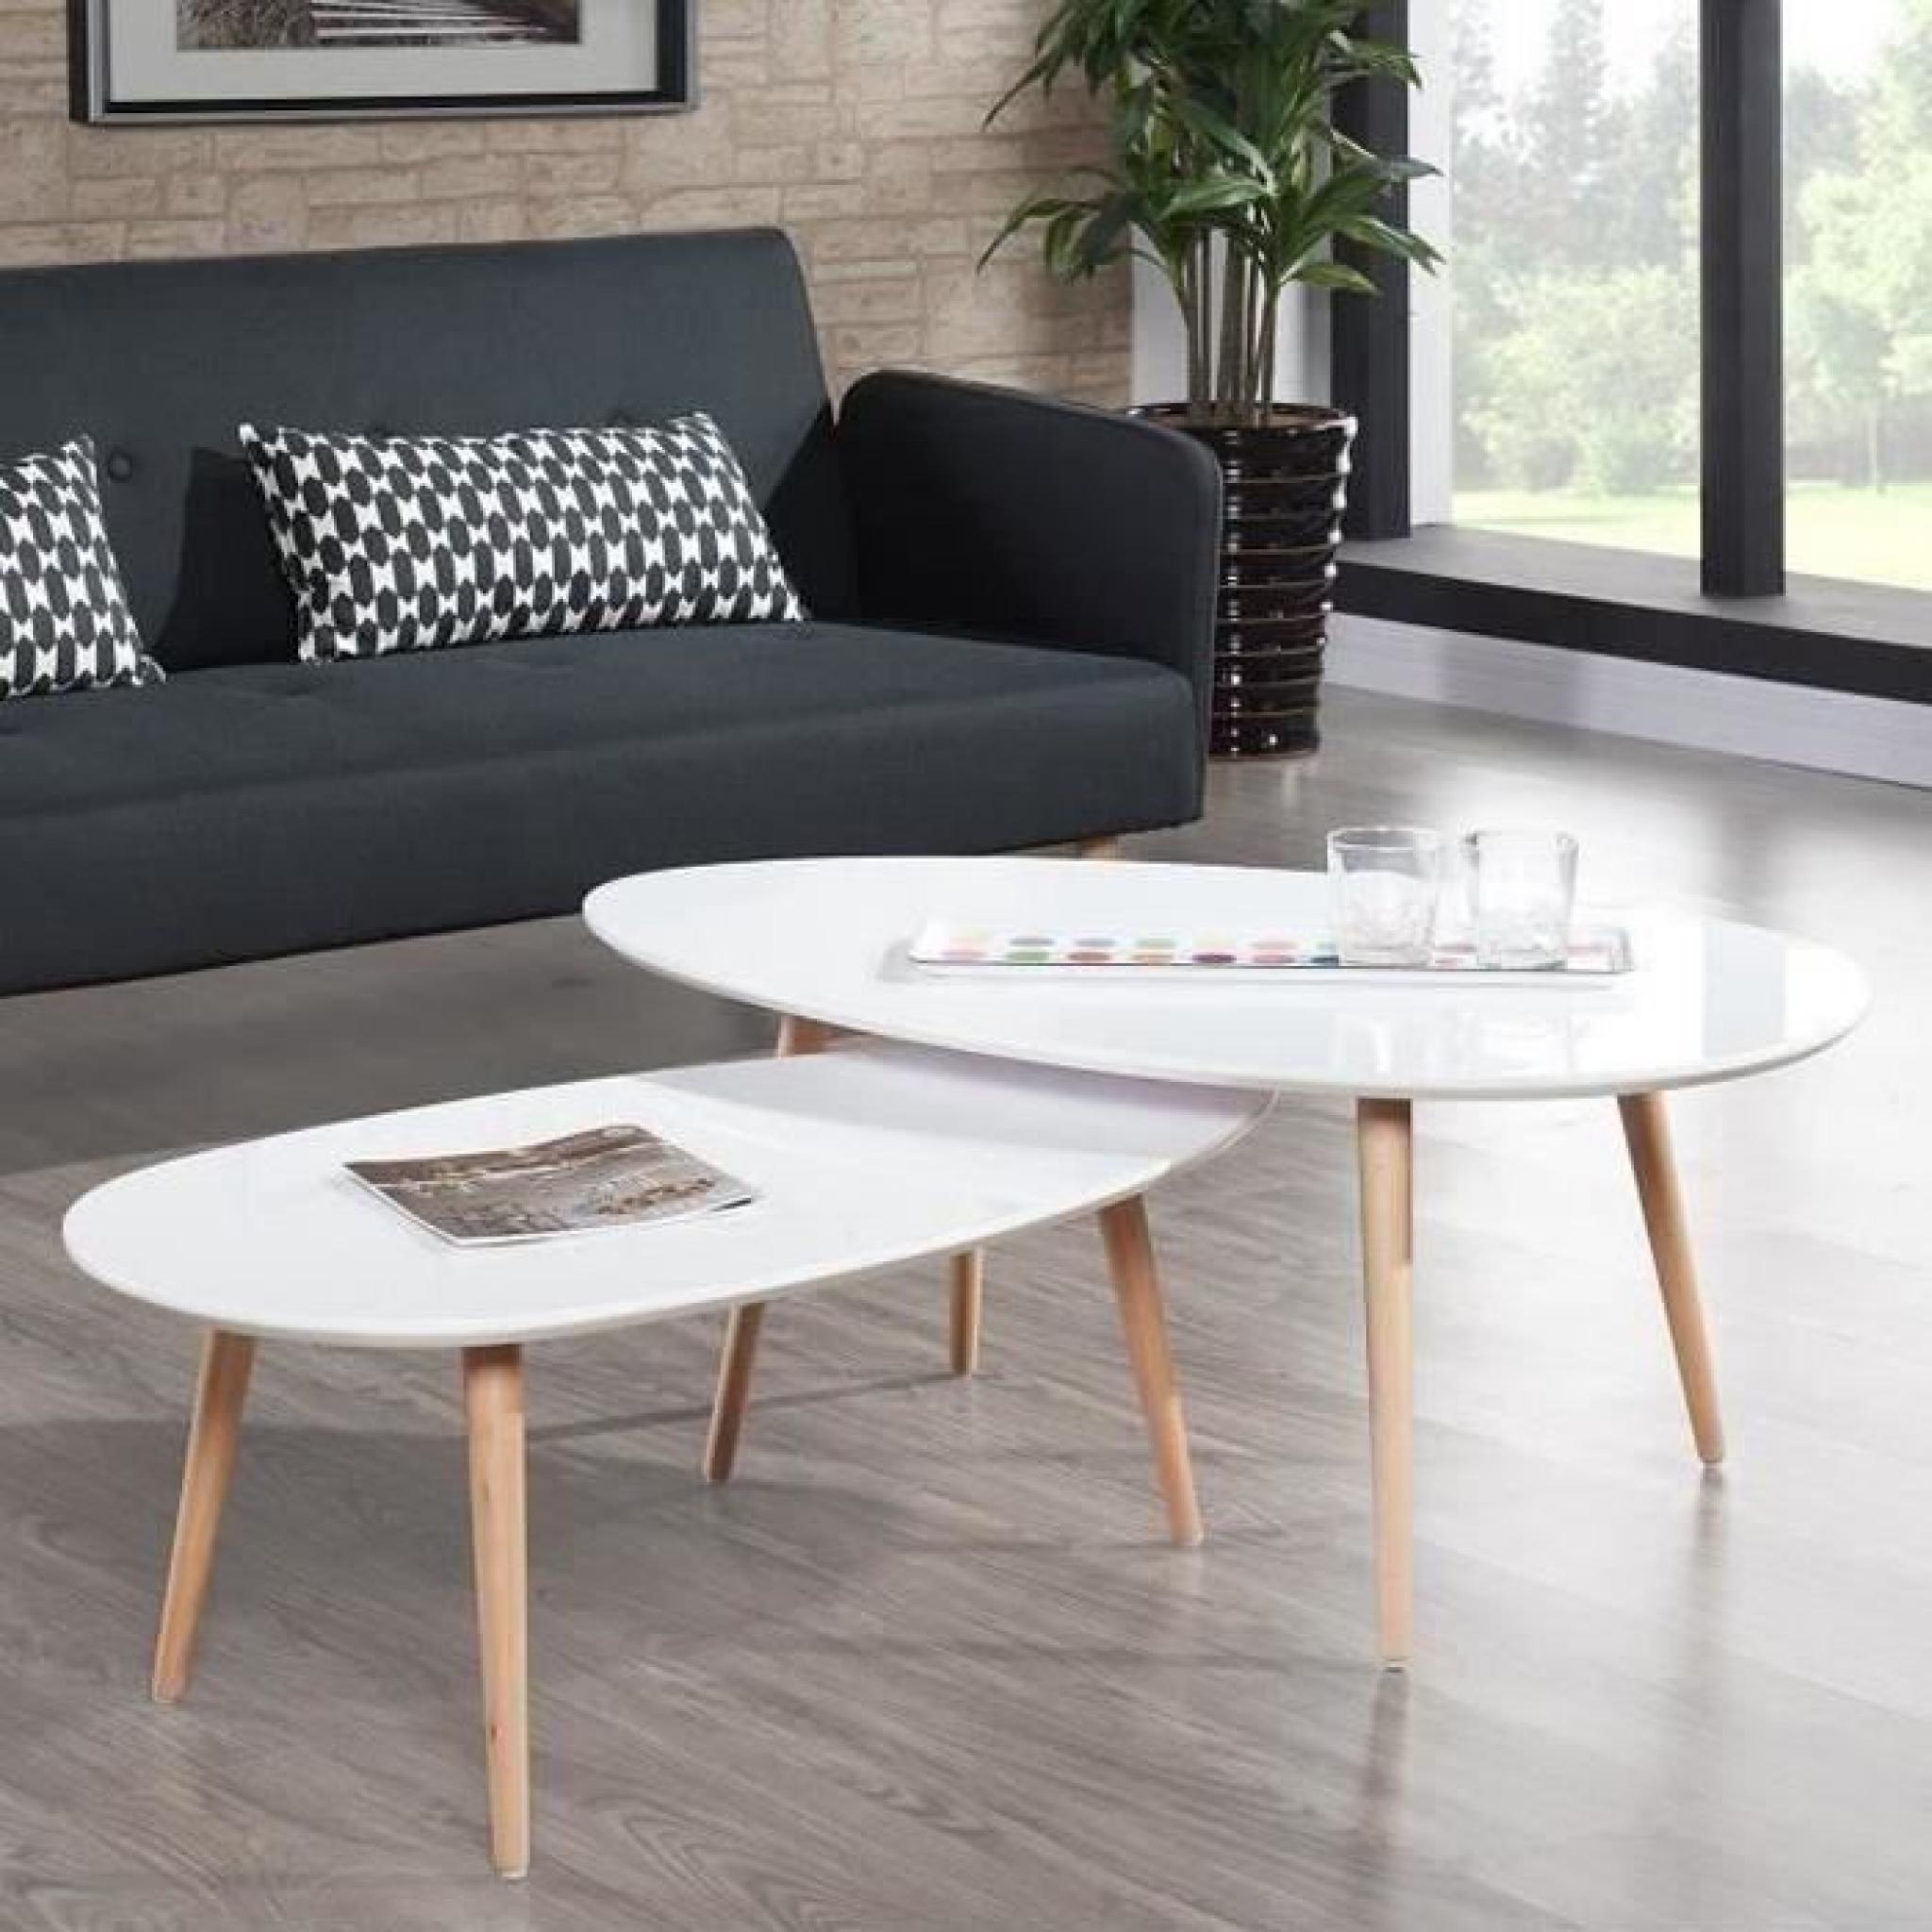 Etonnant Table Basse Design Pas Cher Decoration Francaise In 2019